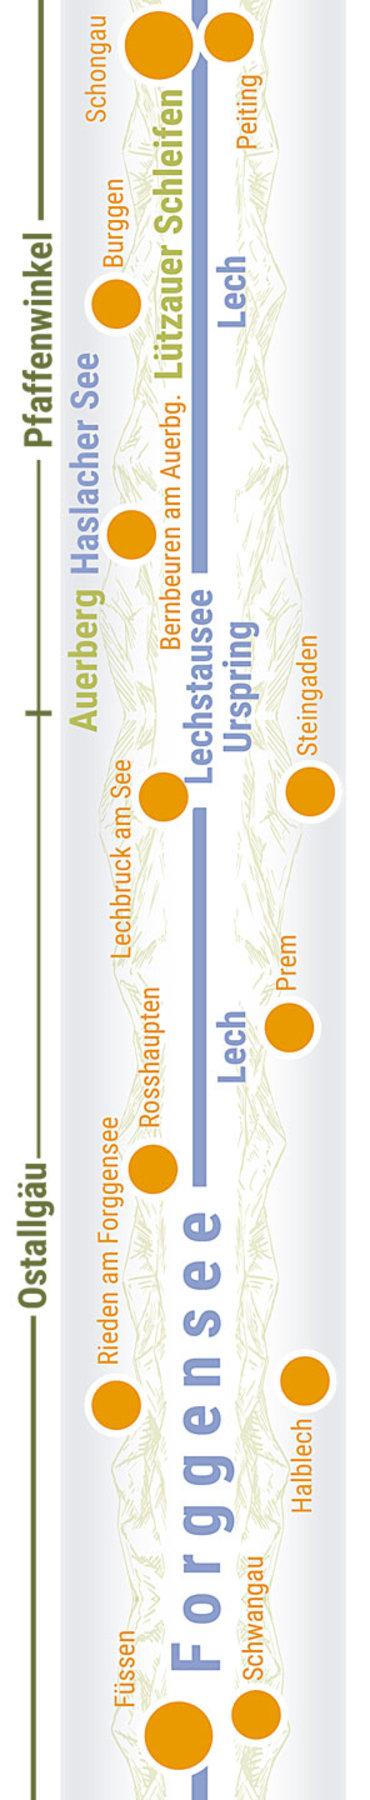 Übersichtskarte rechts Teilabschnitt 08 Auerbergland